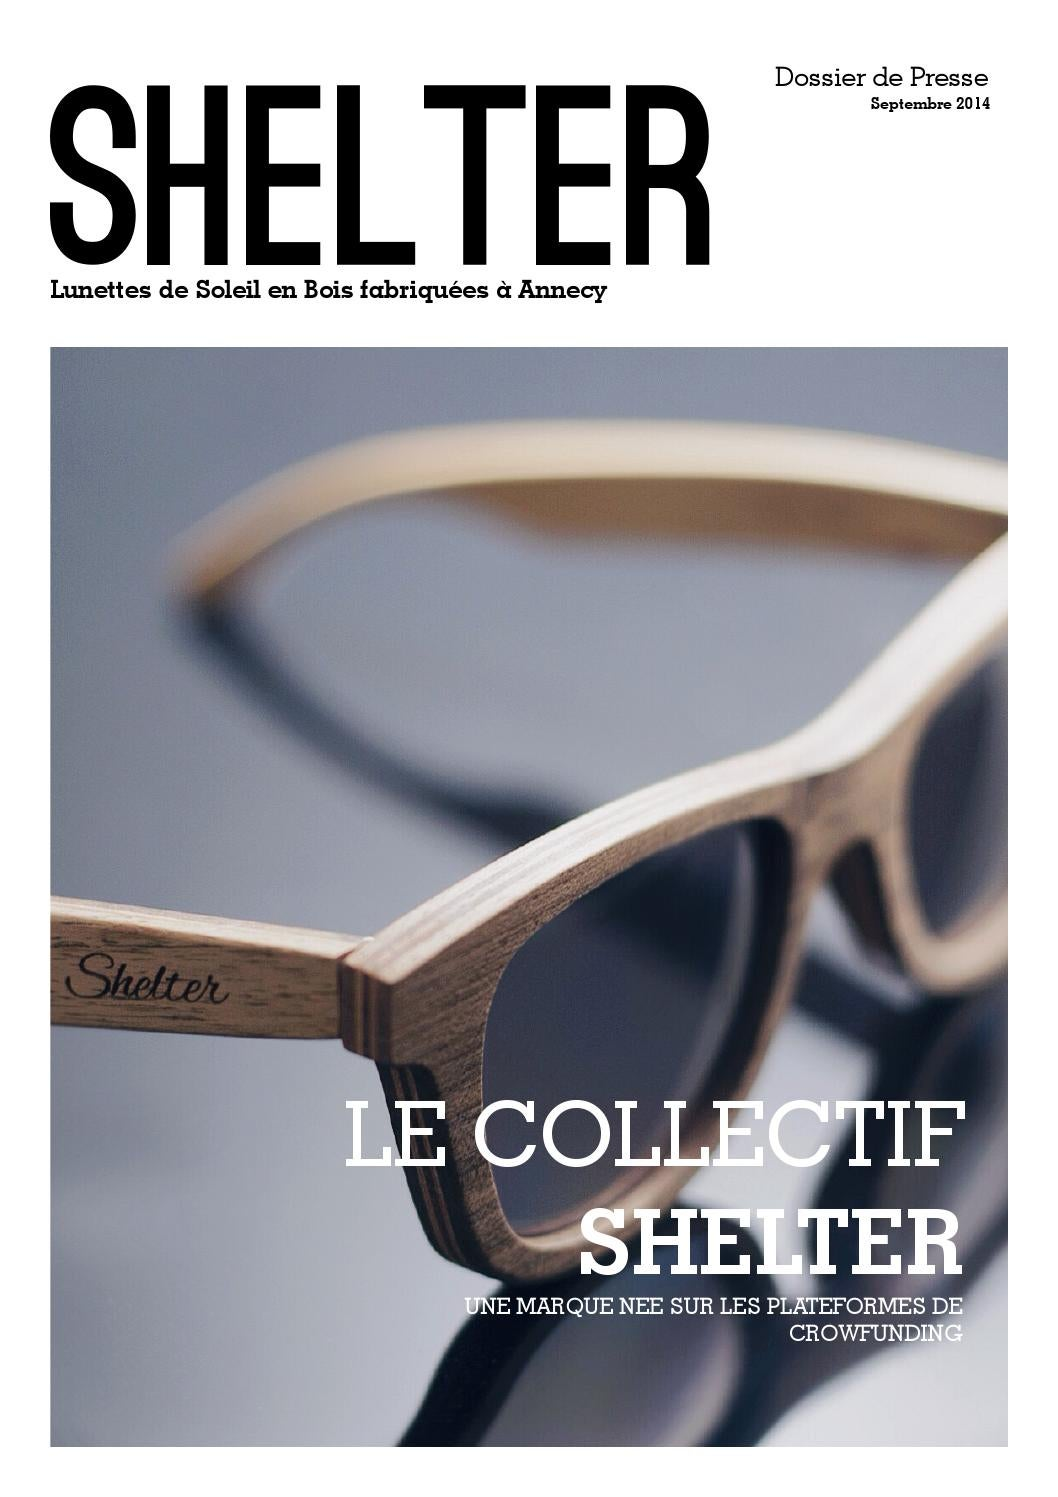 magasin en ligne f16d8 0566a Dossier de Presse Shelter - Lunettes en Bois by Florent ...